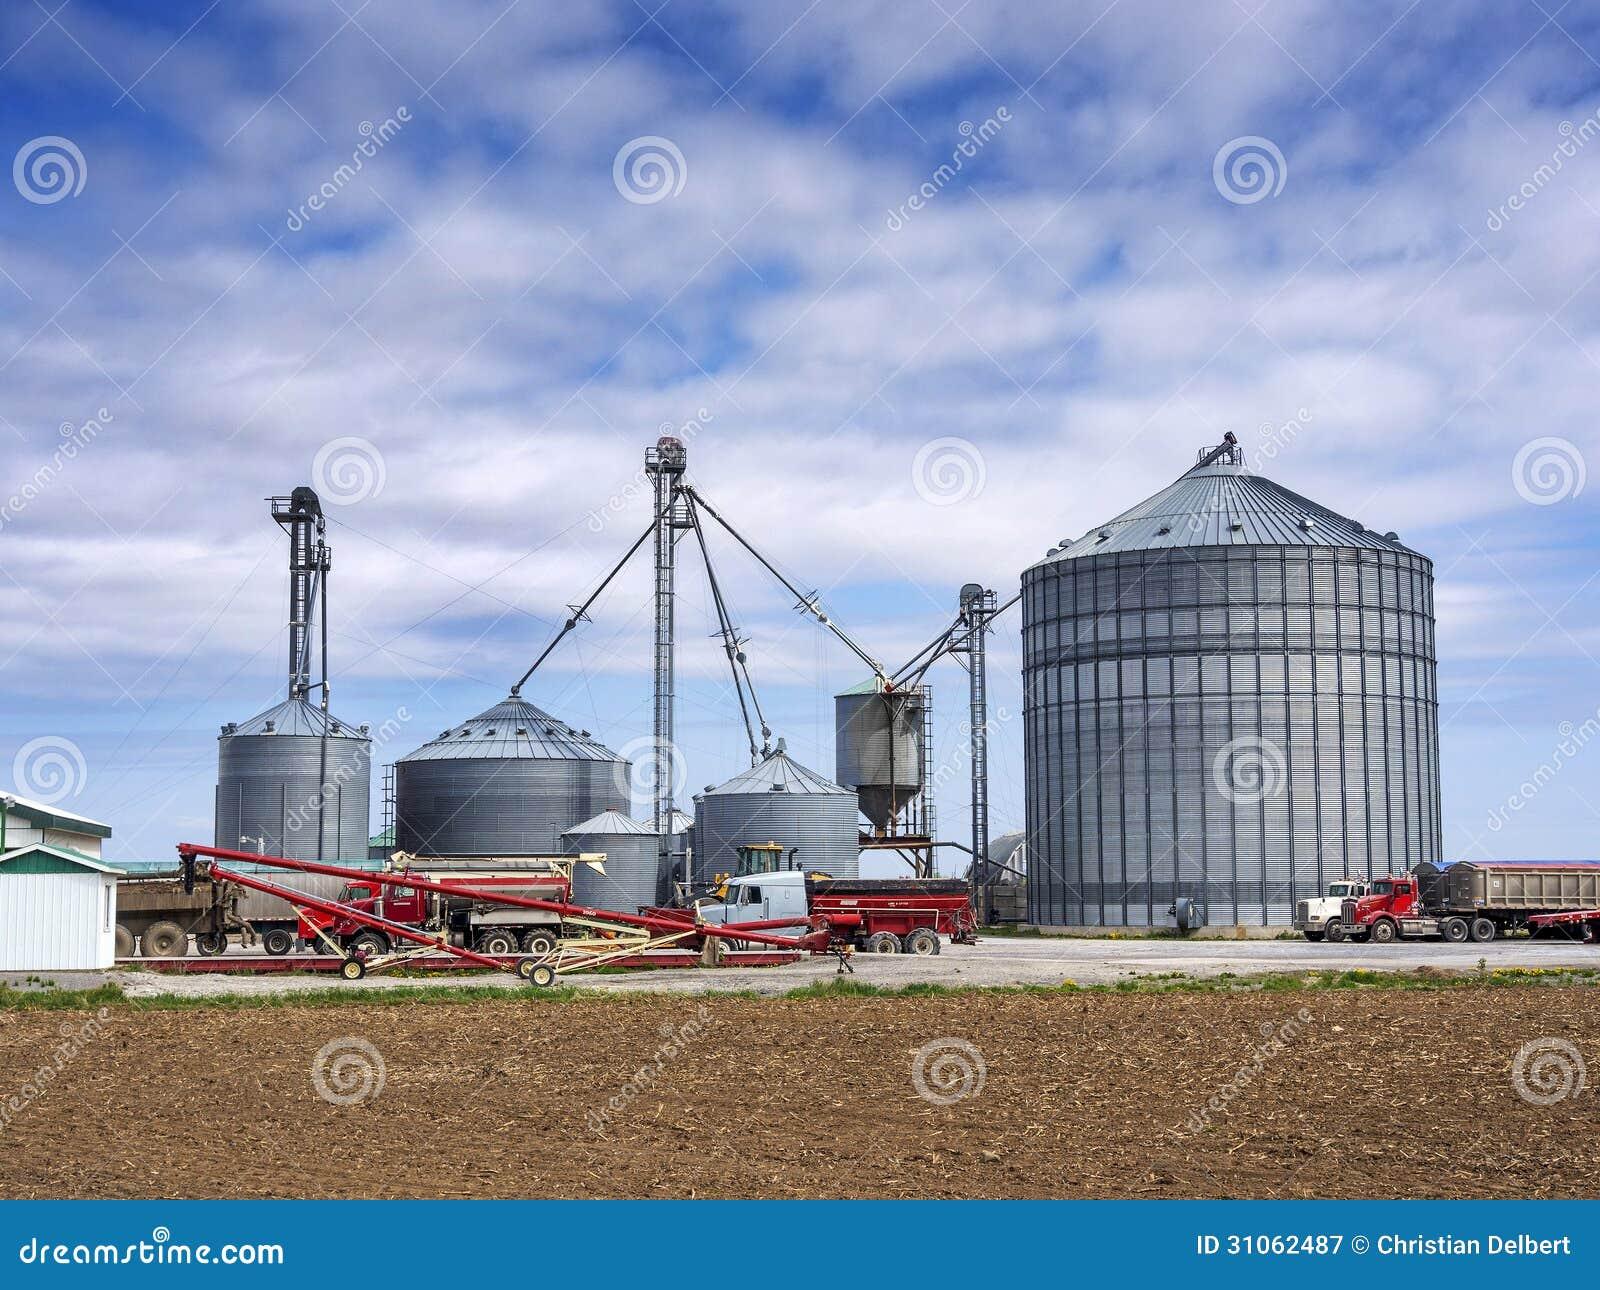 A Sample Wheat Farming Business Plan Template